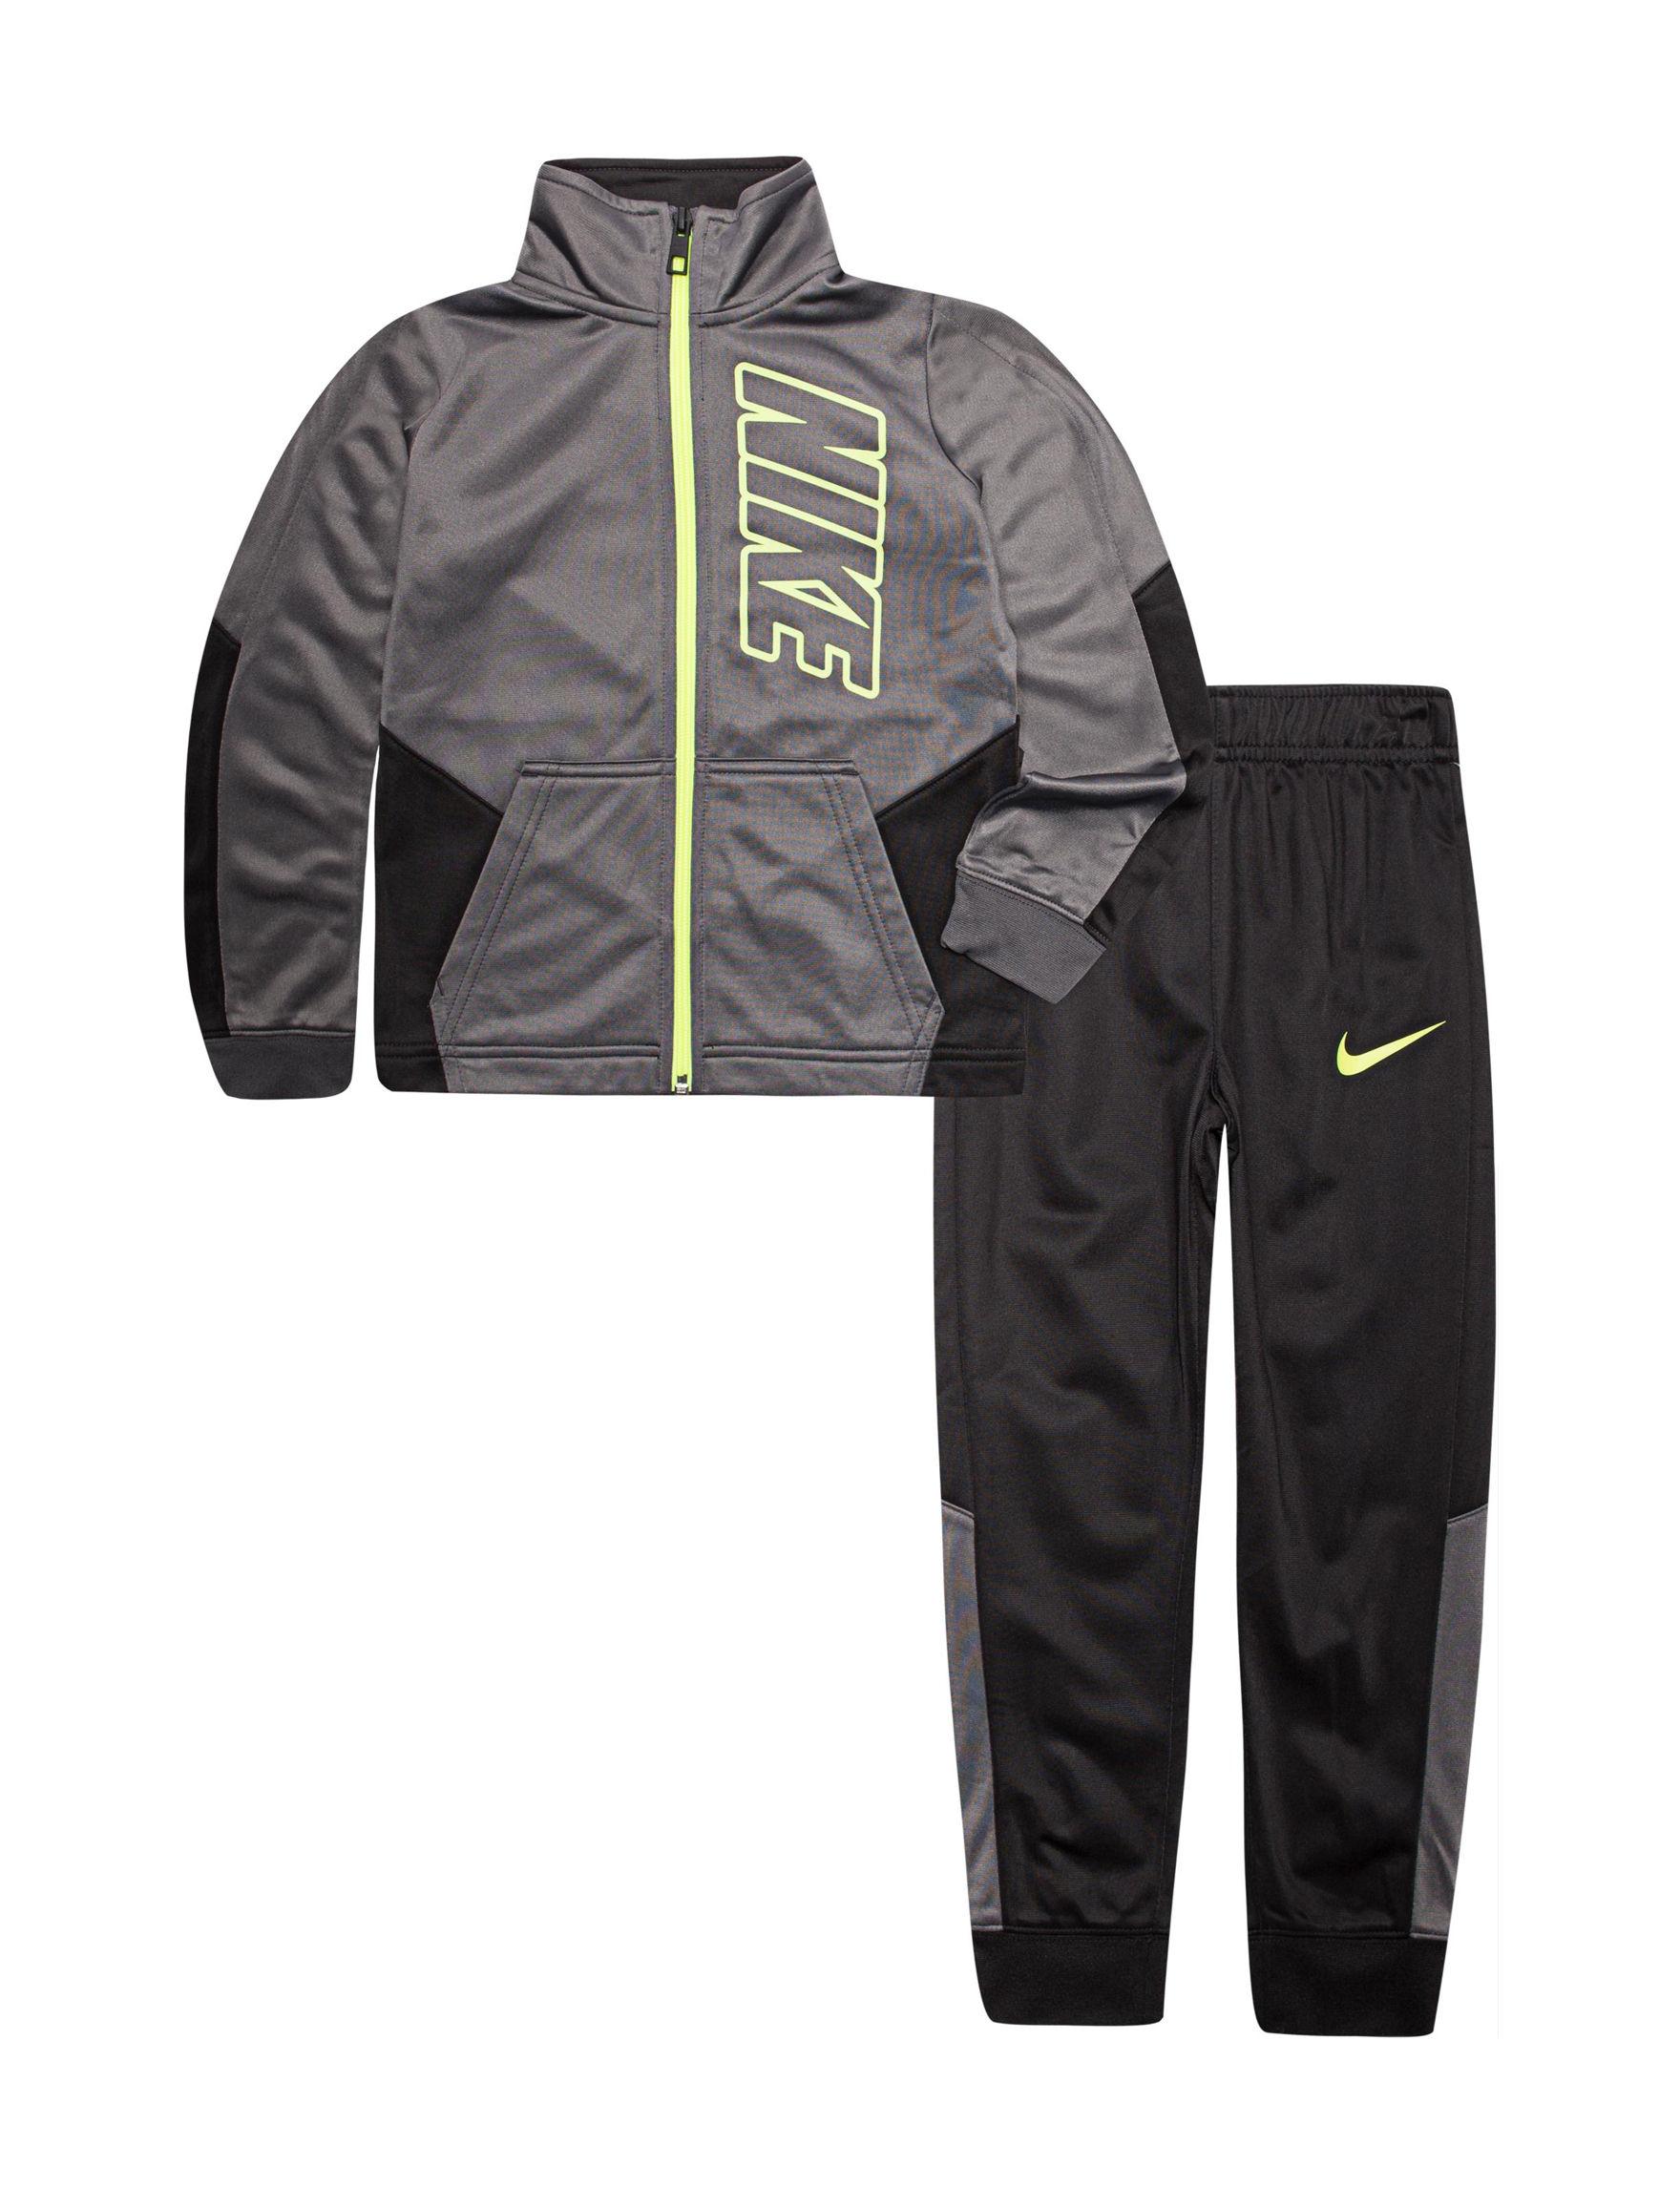 Nike Grey / Black